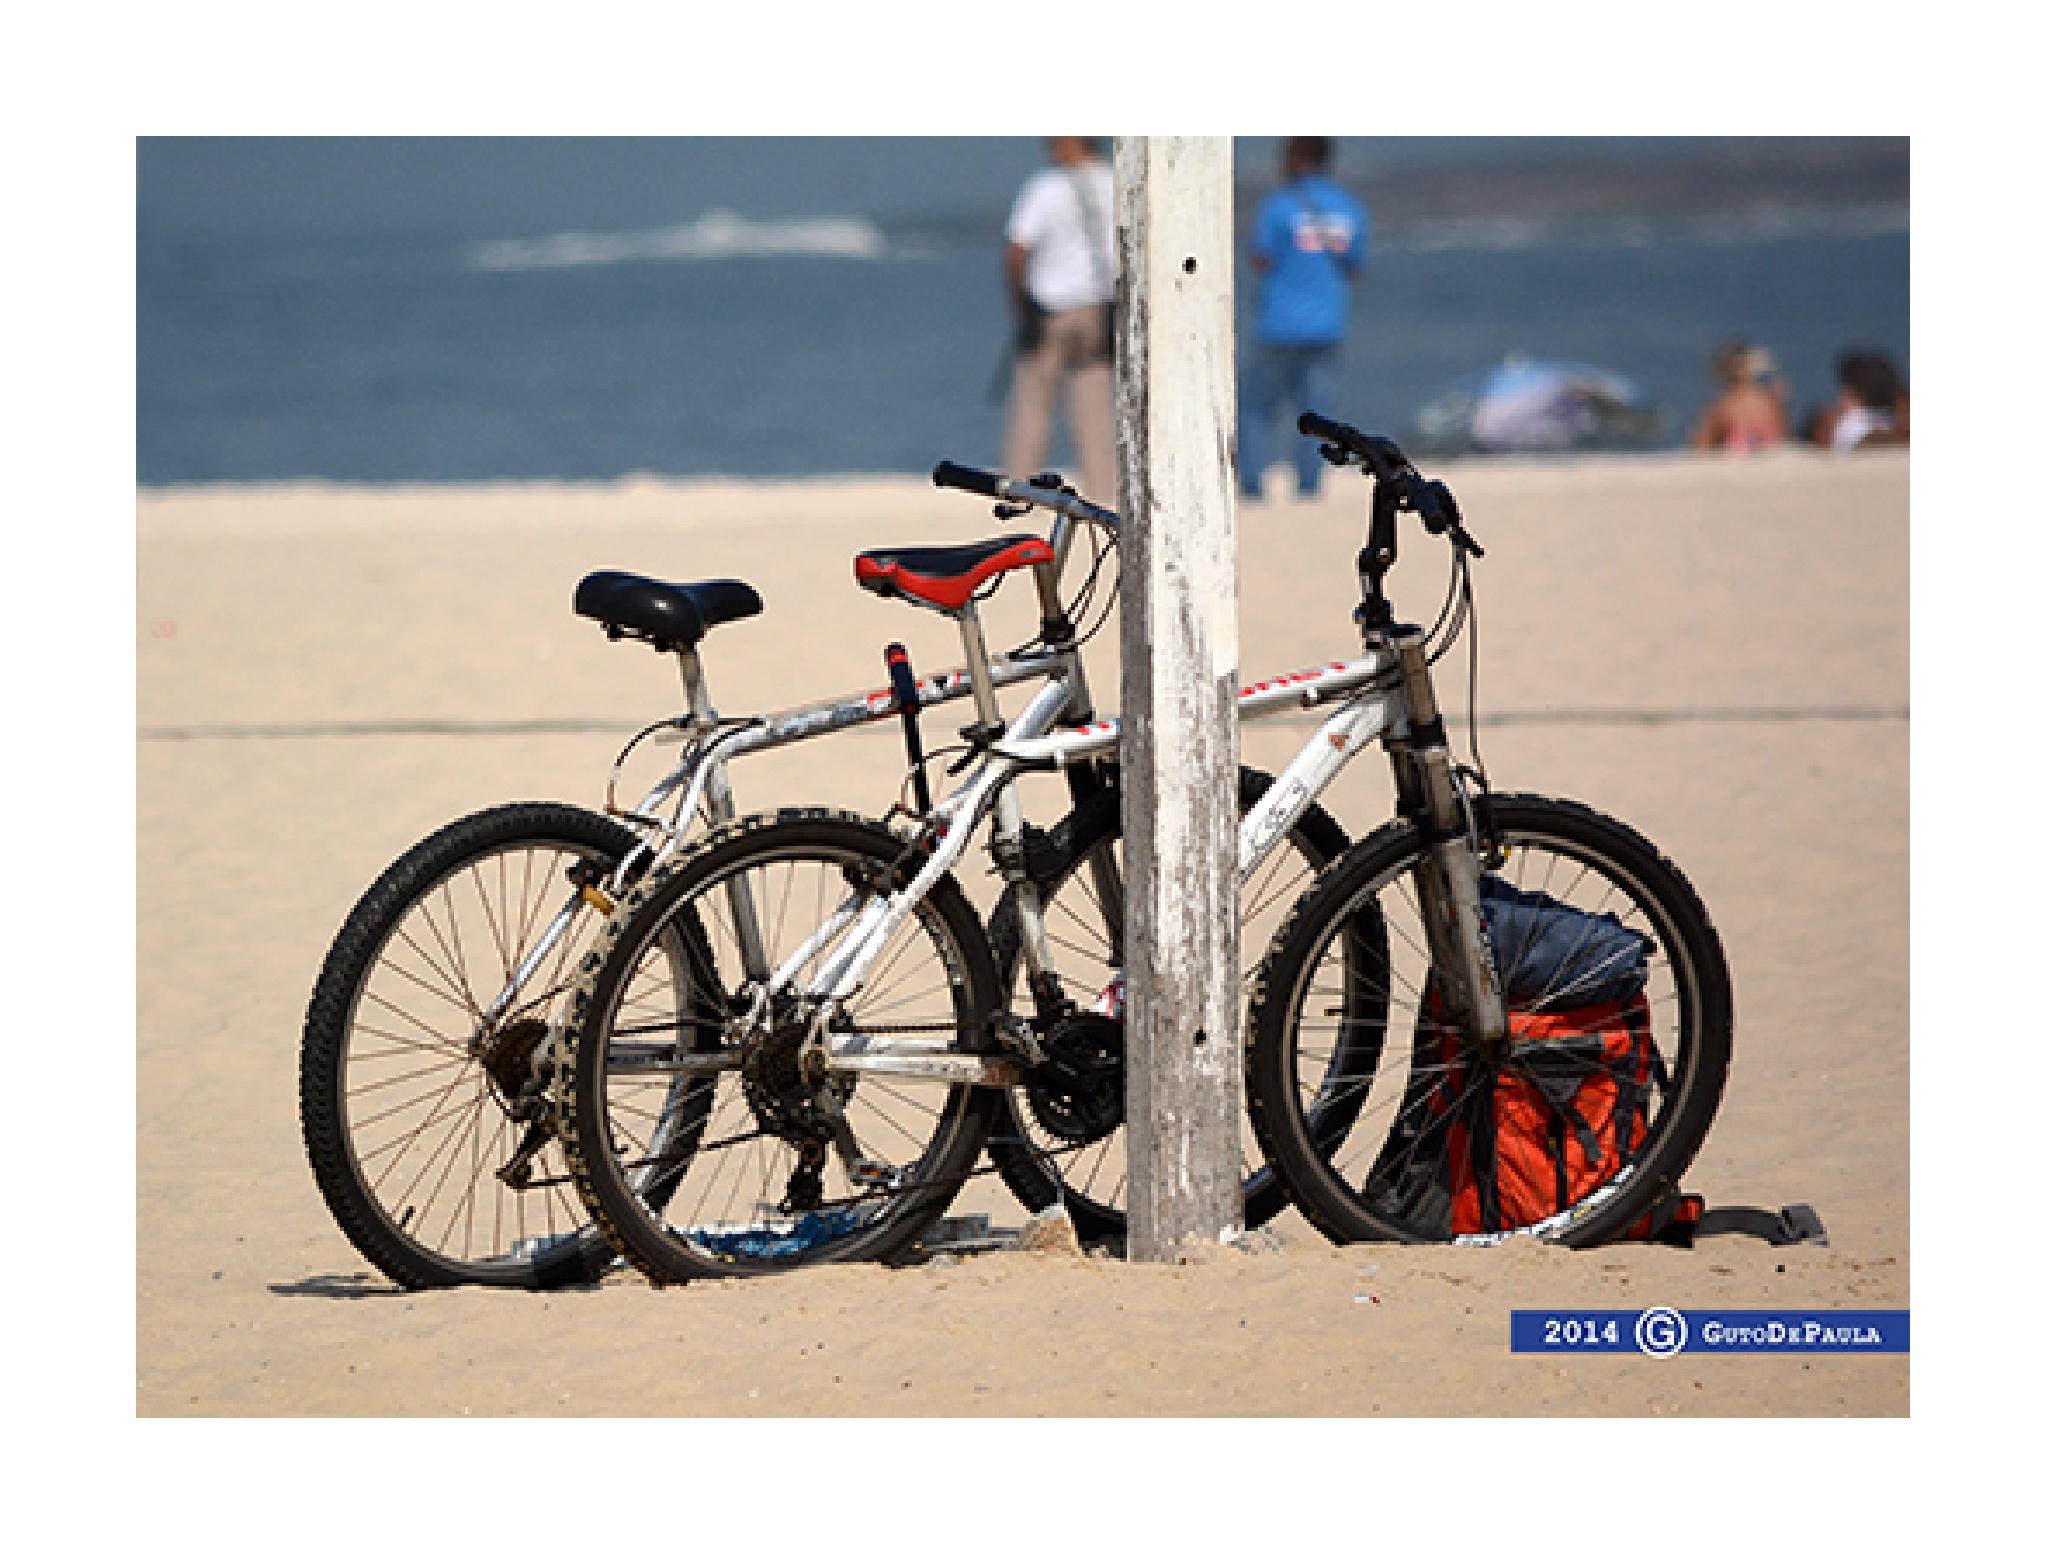 Bikes & Beachs by Luis De Paula